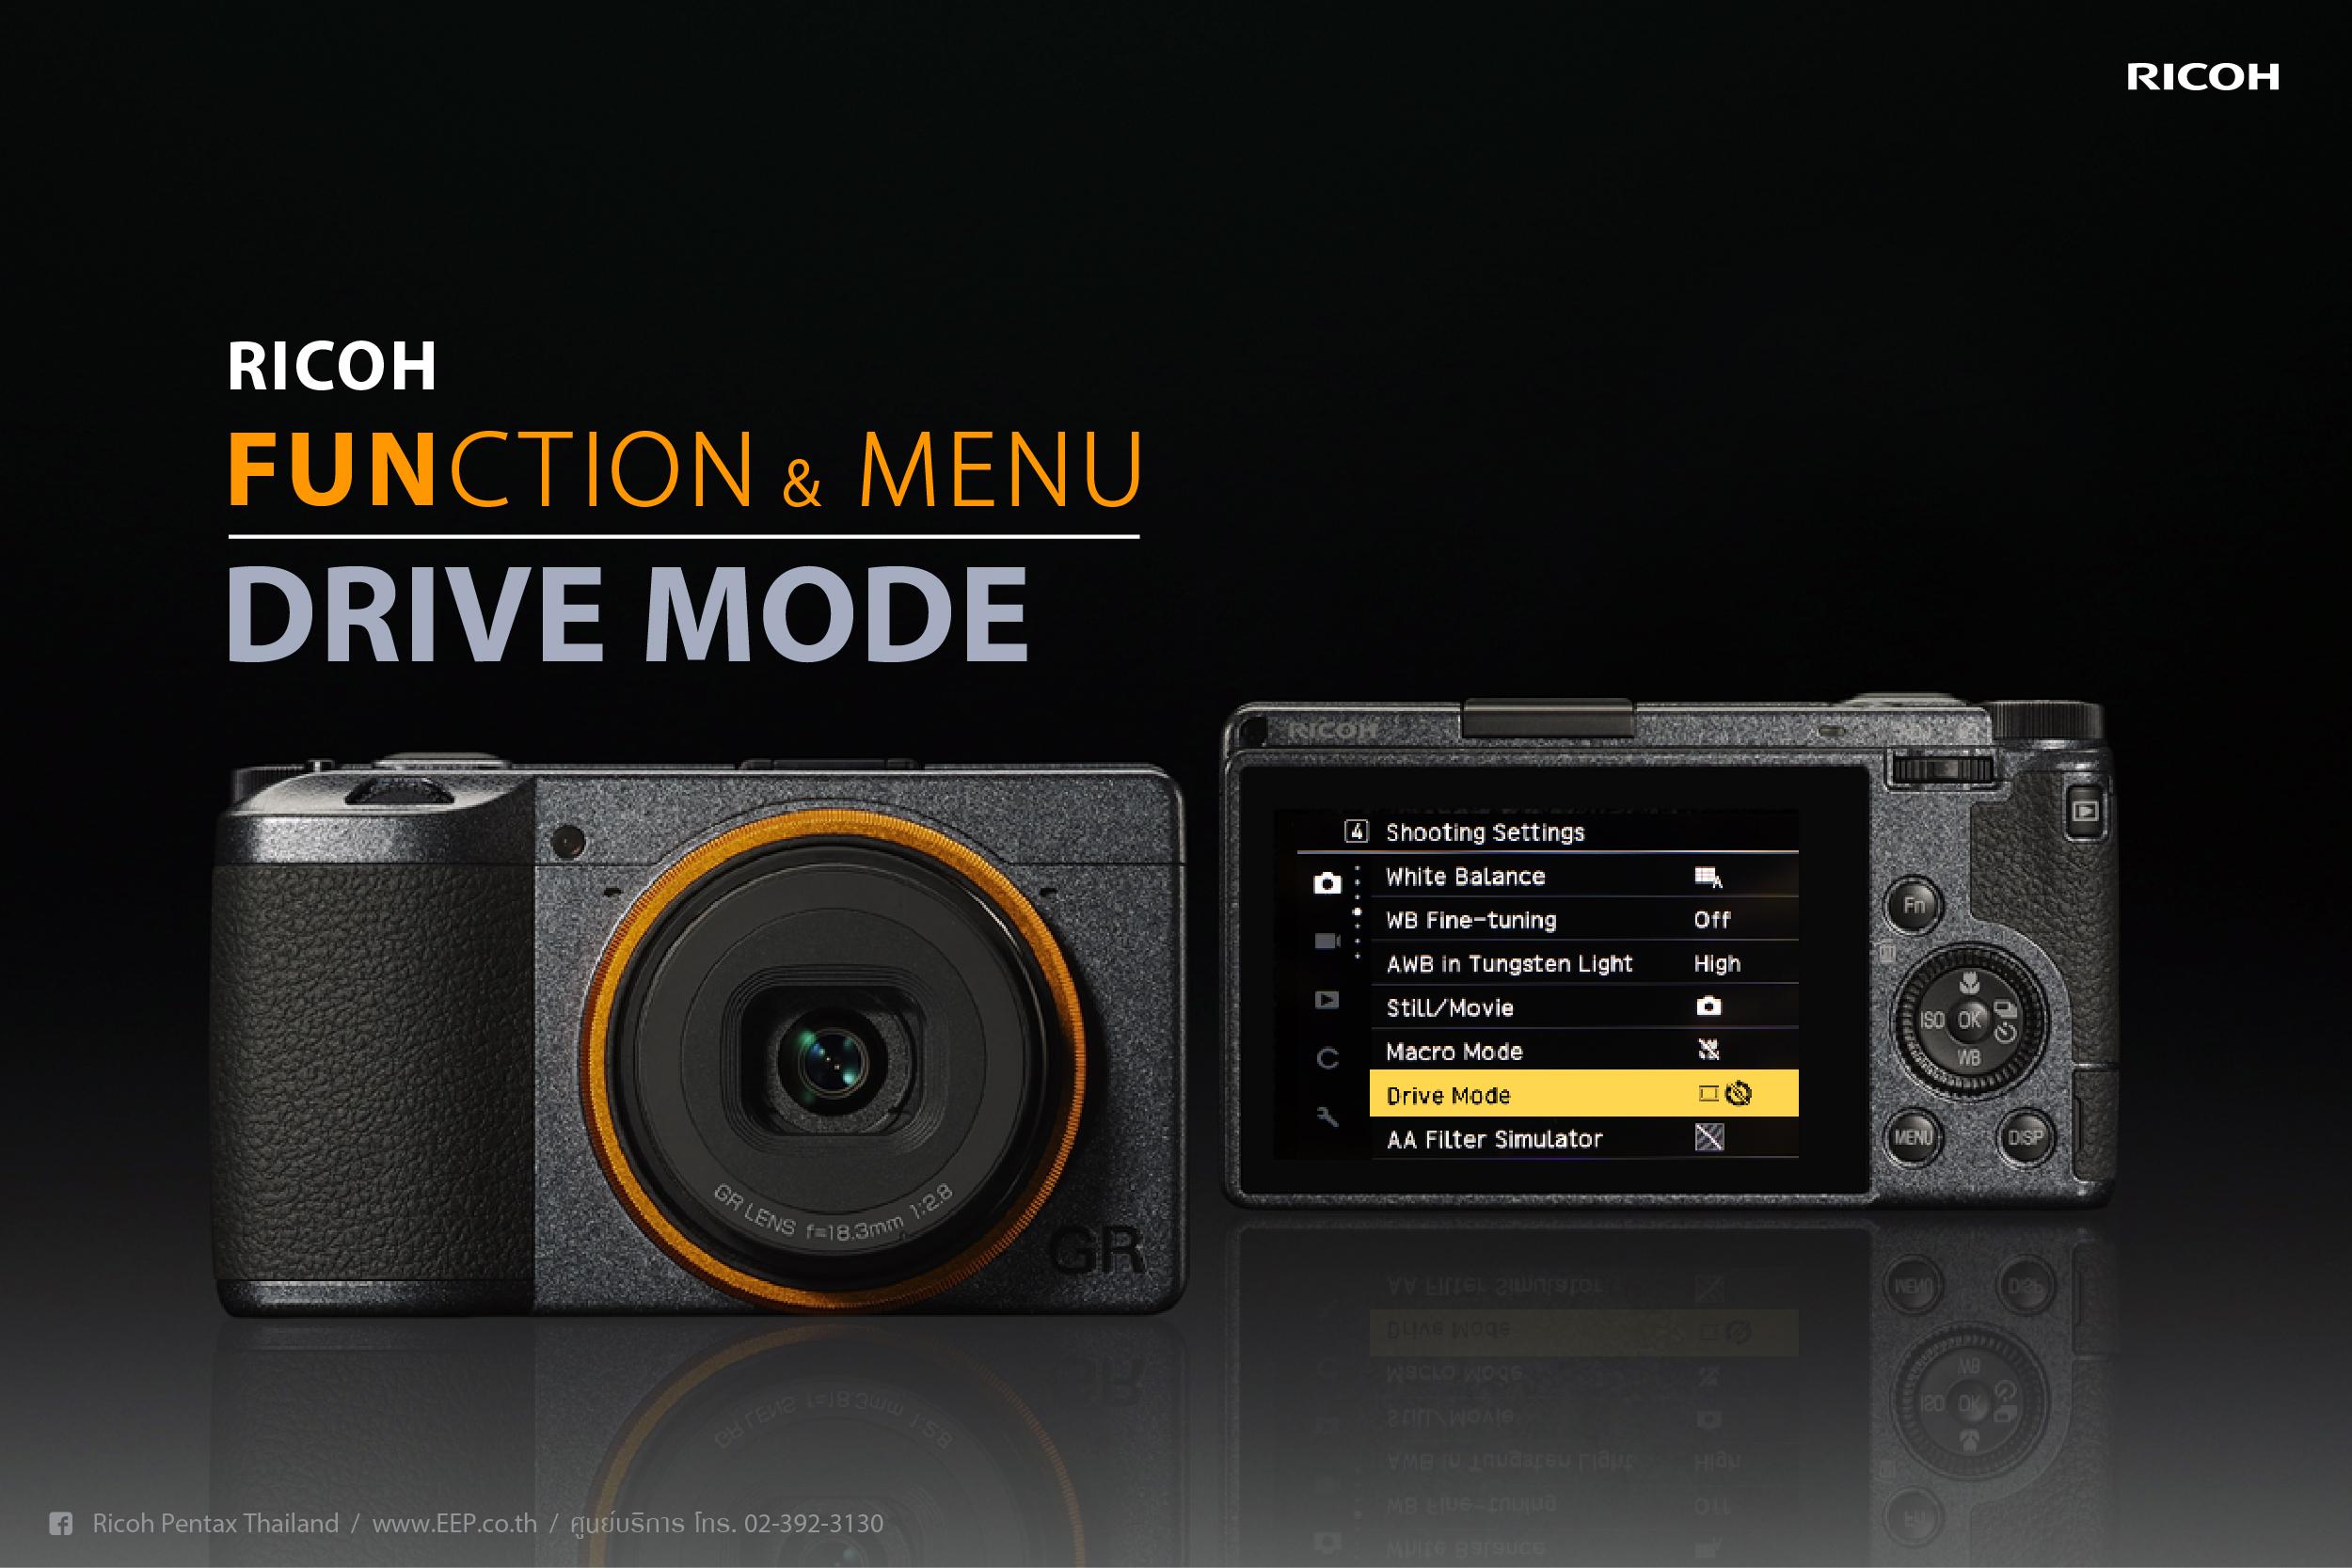 RICOH Function & Menu : Drive mode